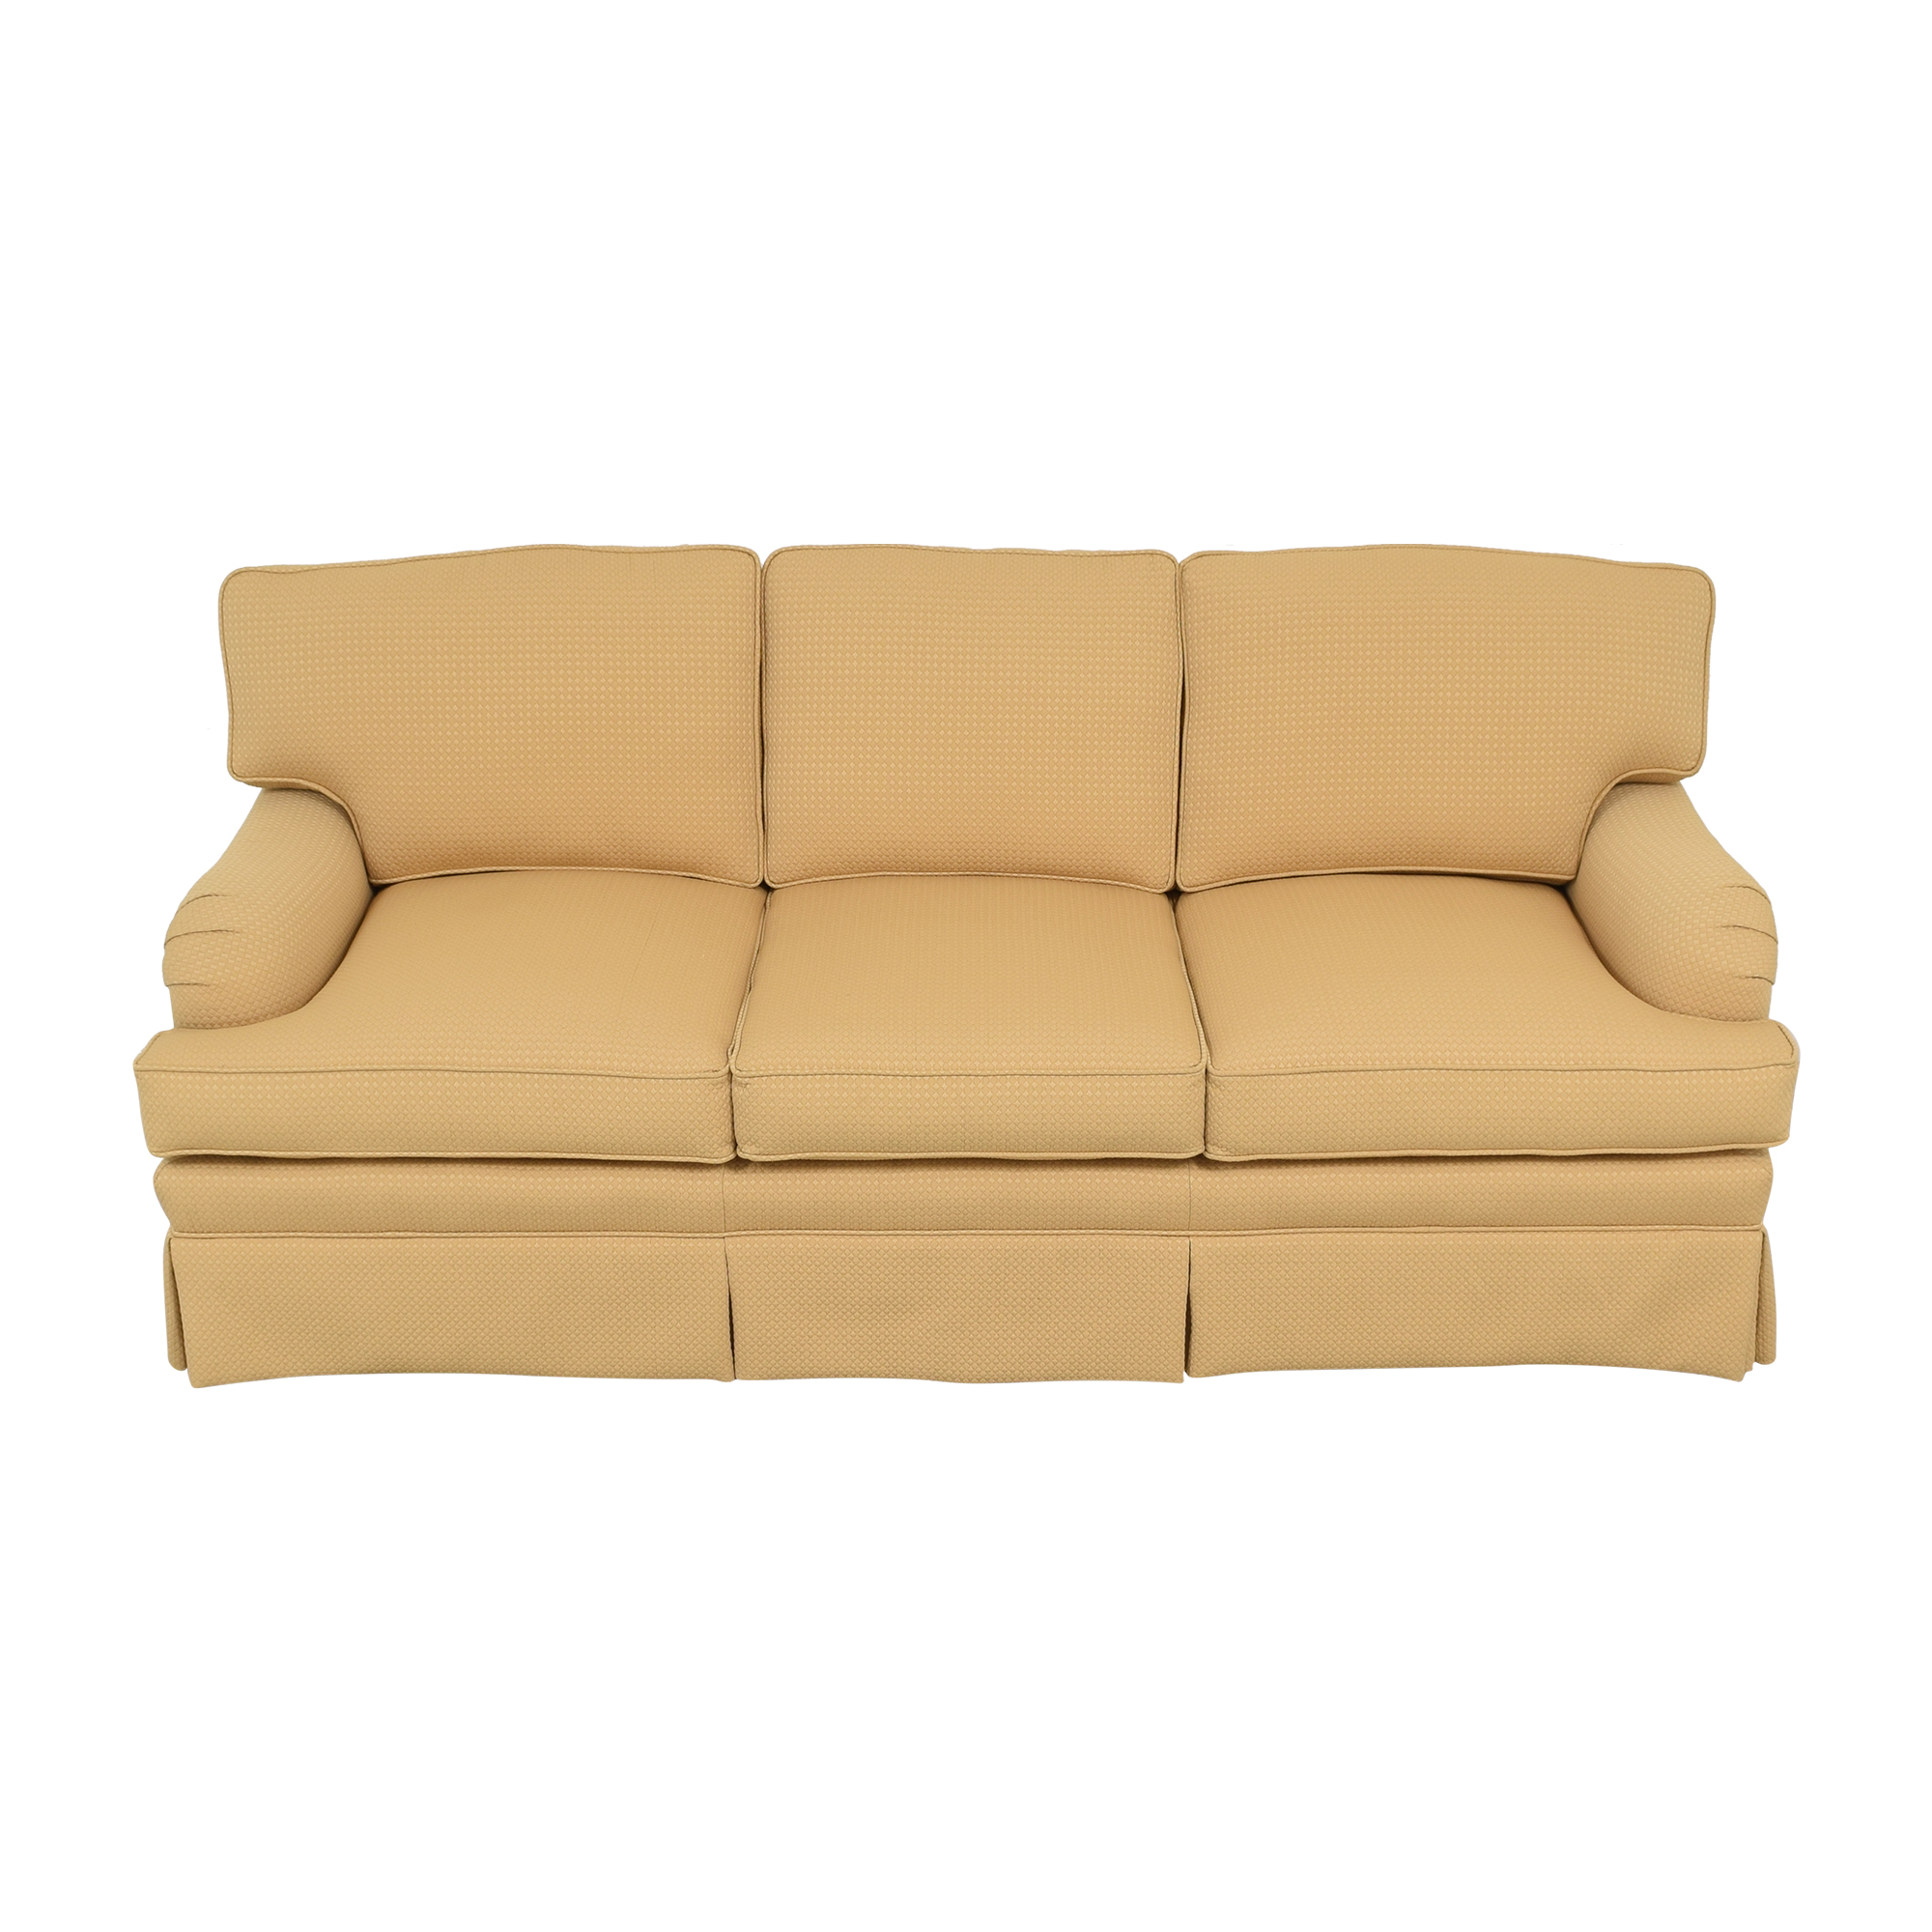 Century Furniture Century Furniture Elegance Sofa tan